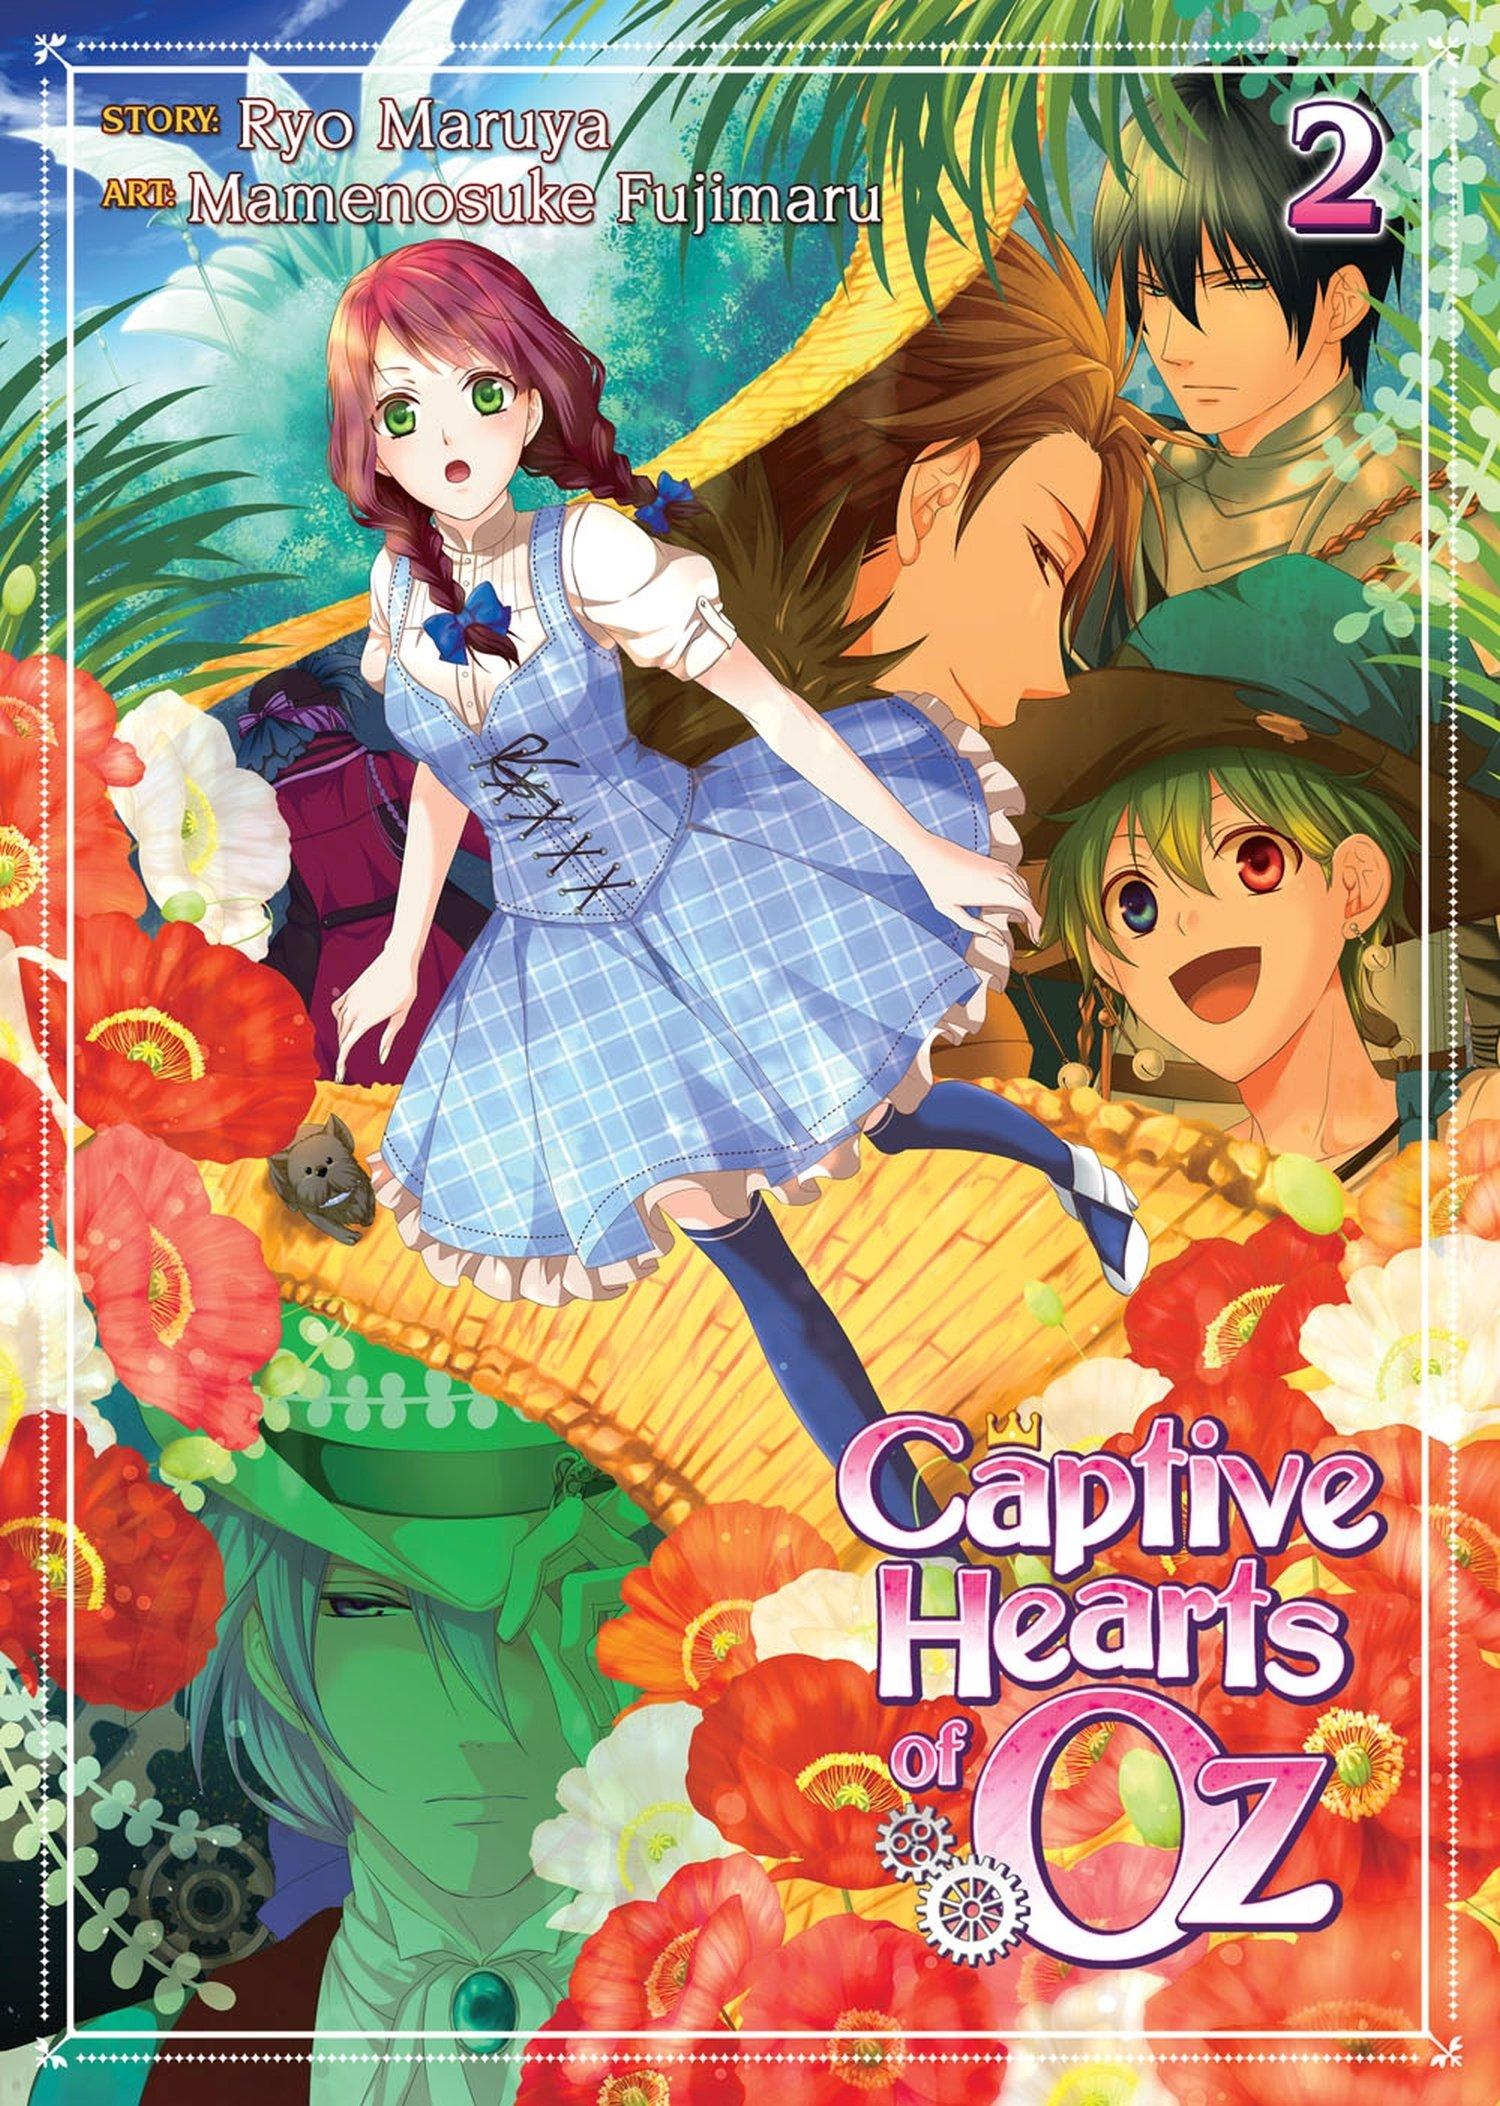 Amazon.com: Captive Hearts of Oz Vol. 2 (9781626925083): Ryo Maruya,  Mamenosuke Fujimaru: Books